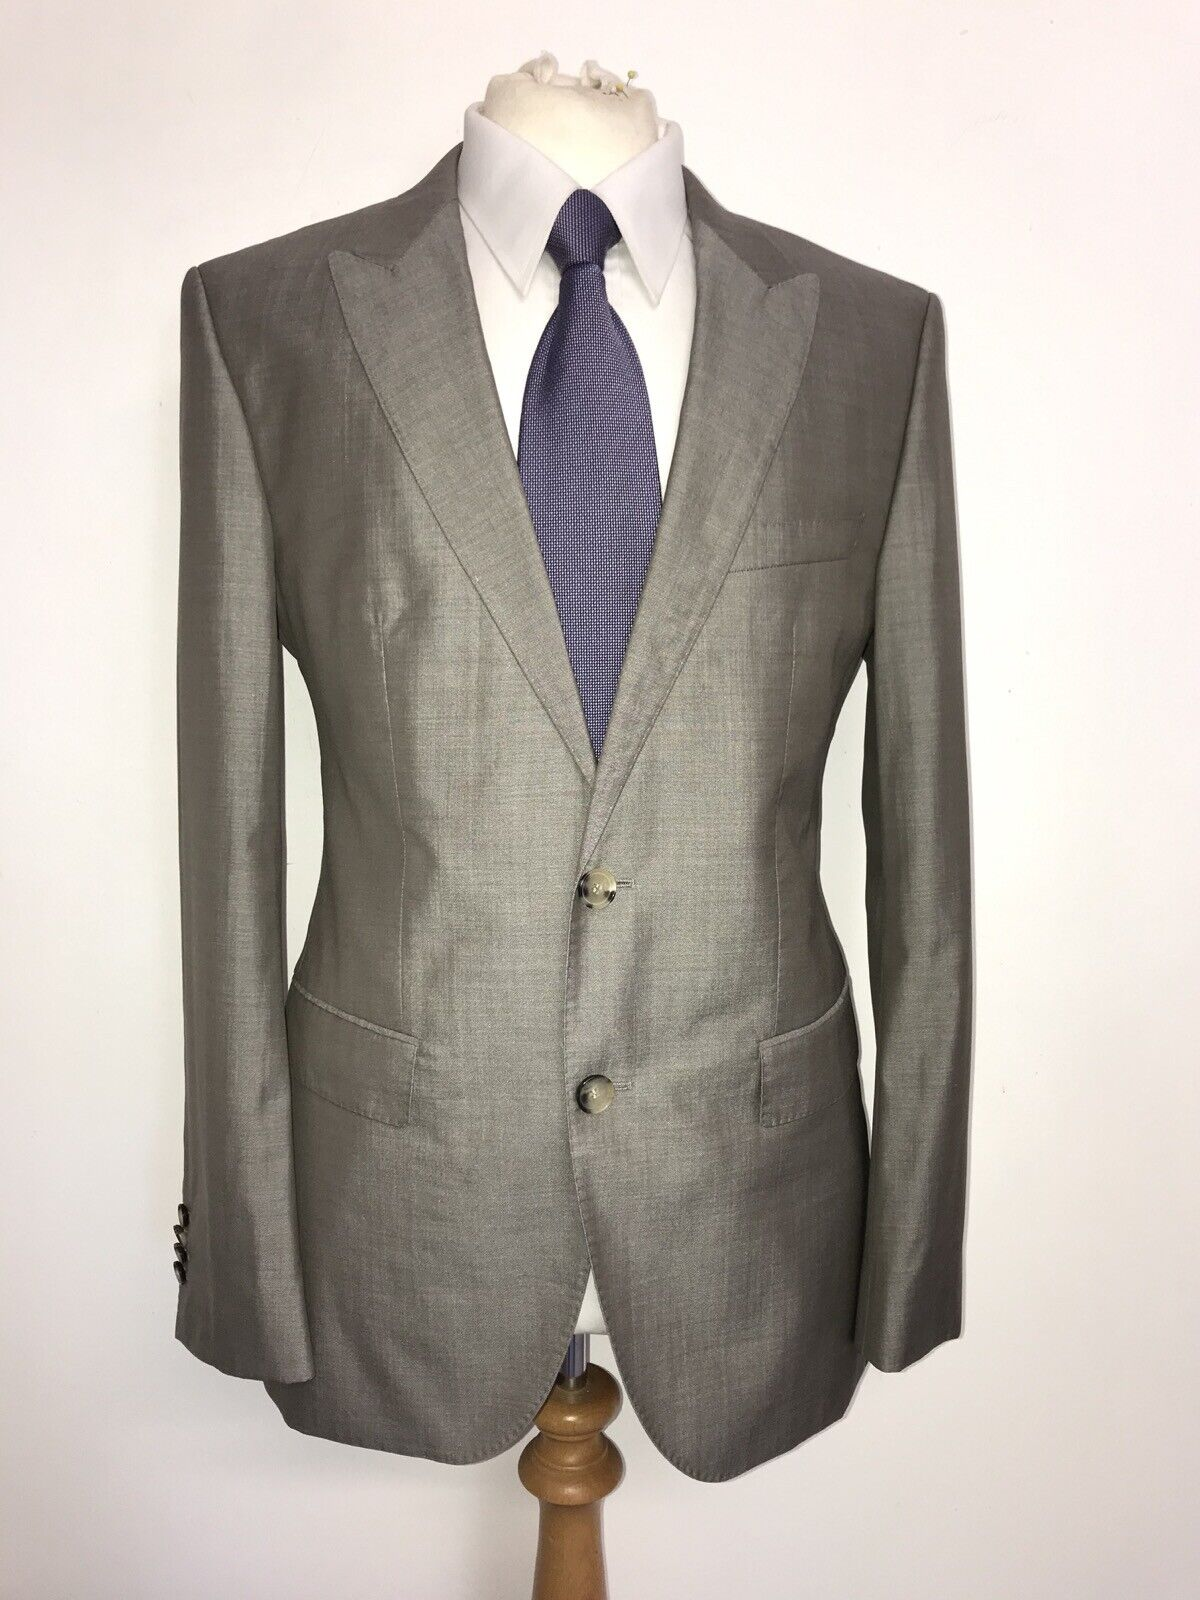 Farah Slim Fit Arnos Tuxedo Suit Trouser BNWT W36 L32 Black